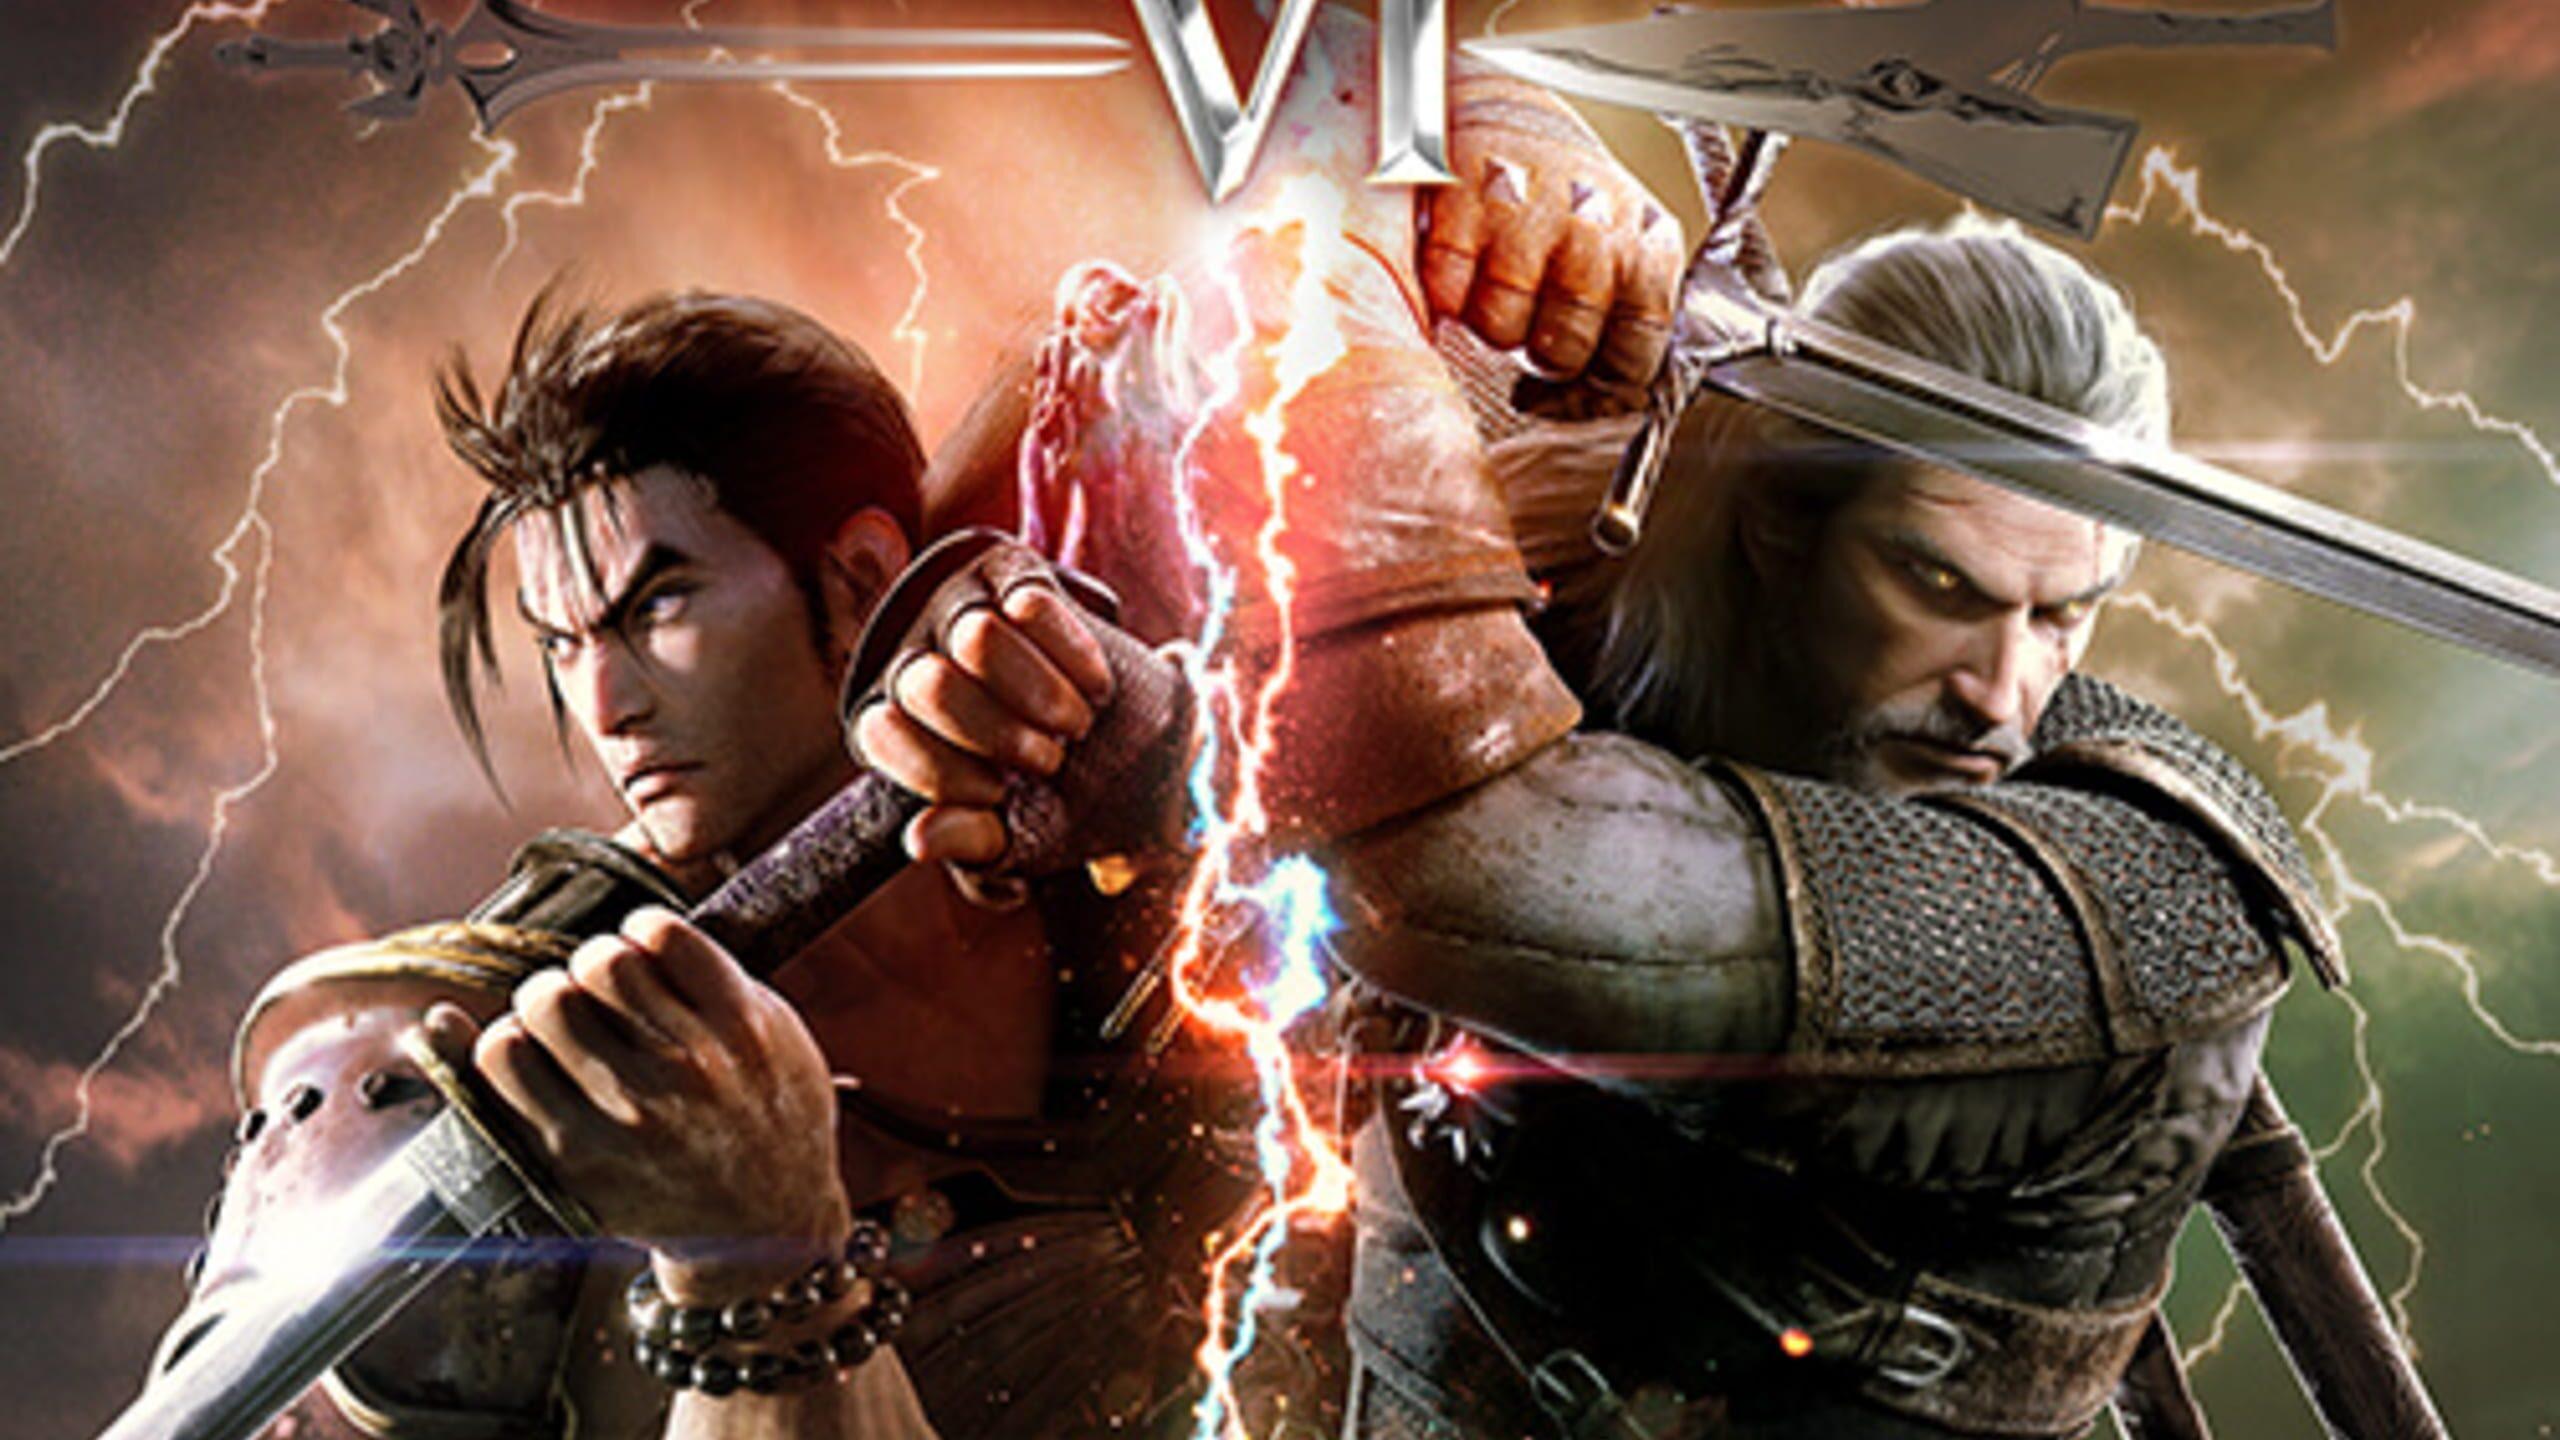 game cover art for SoulCalibur VI